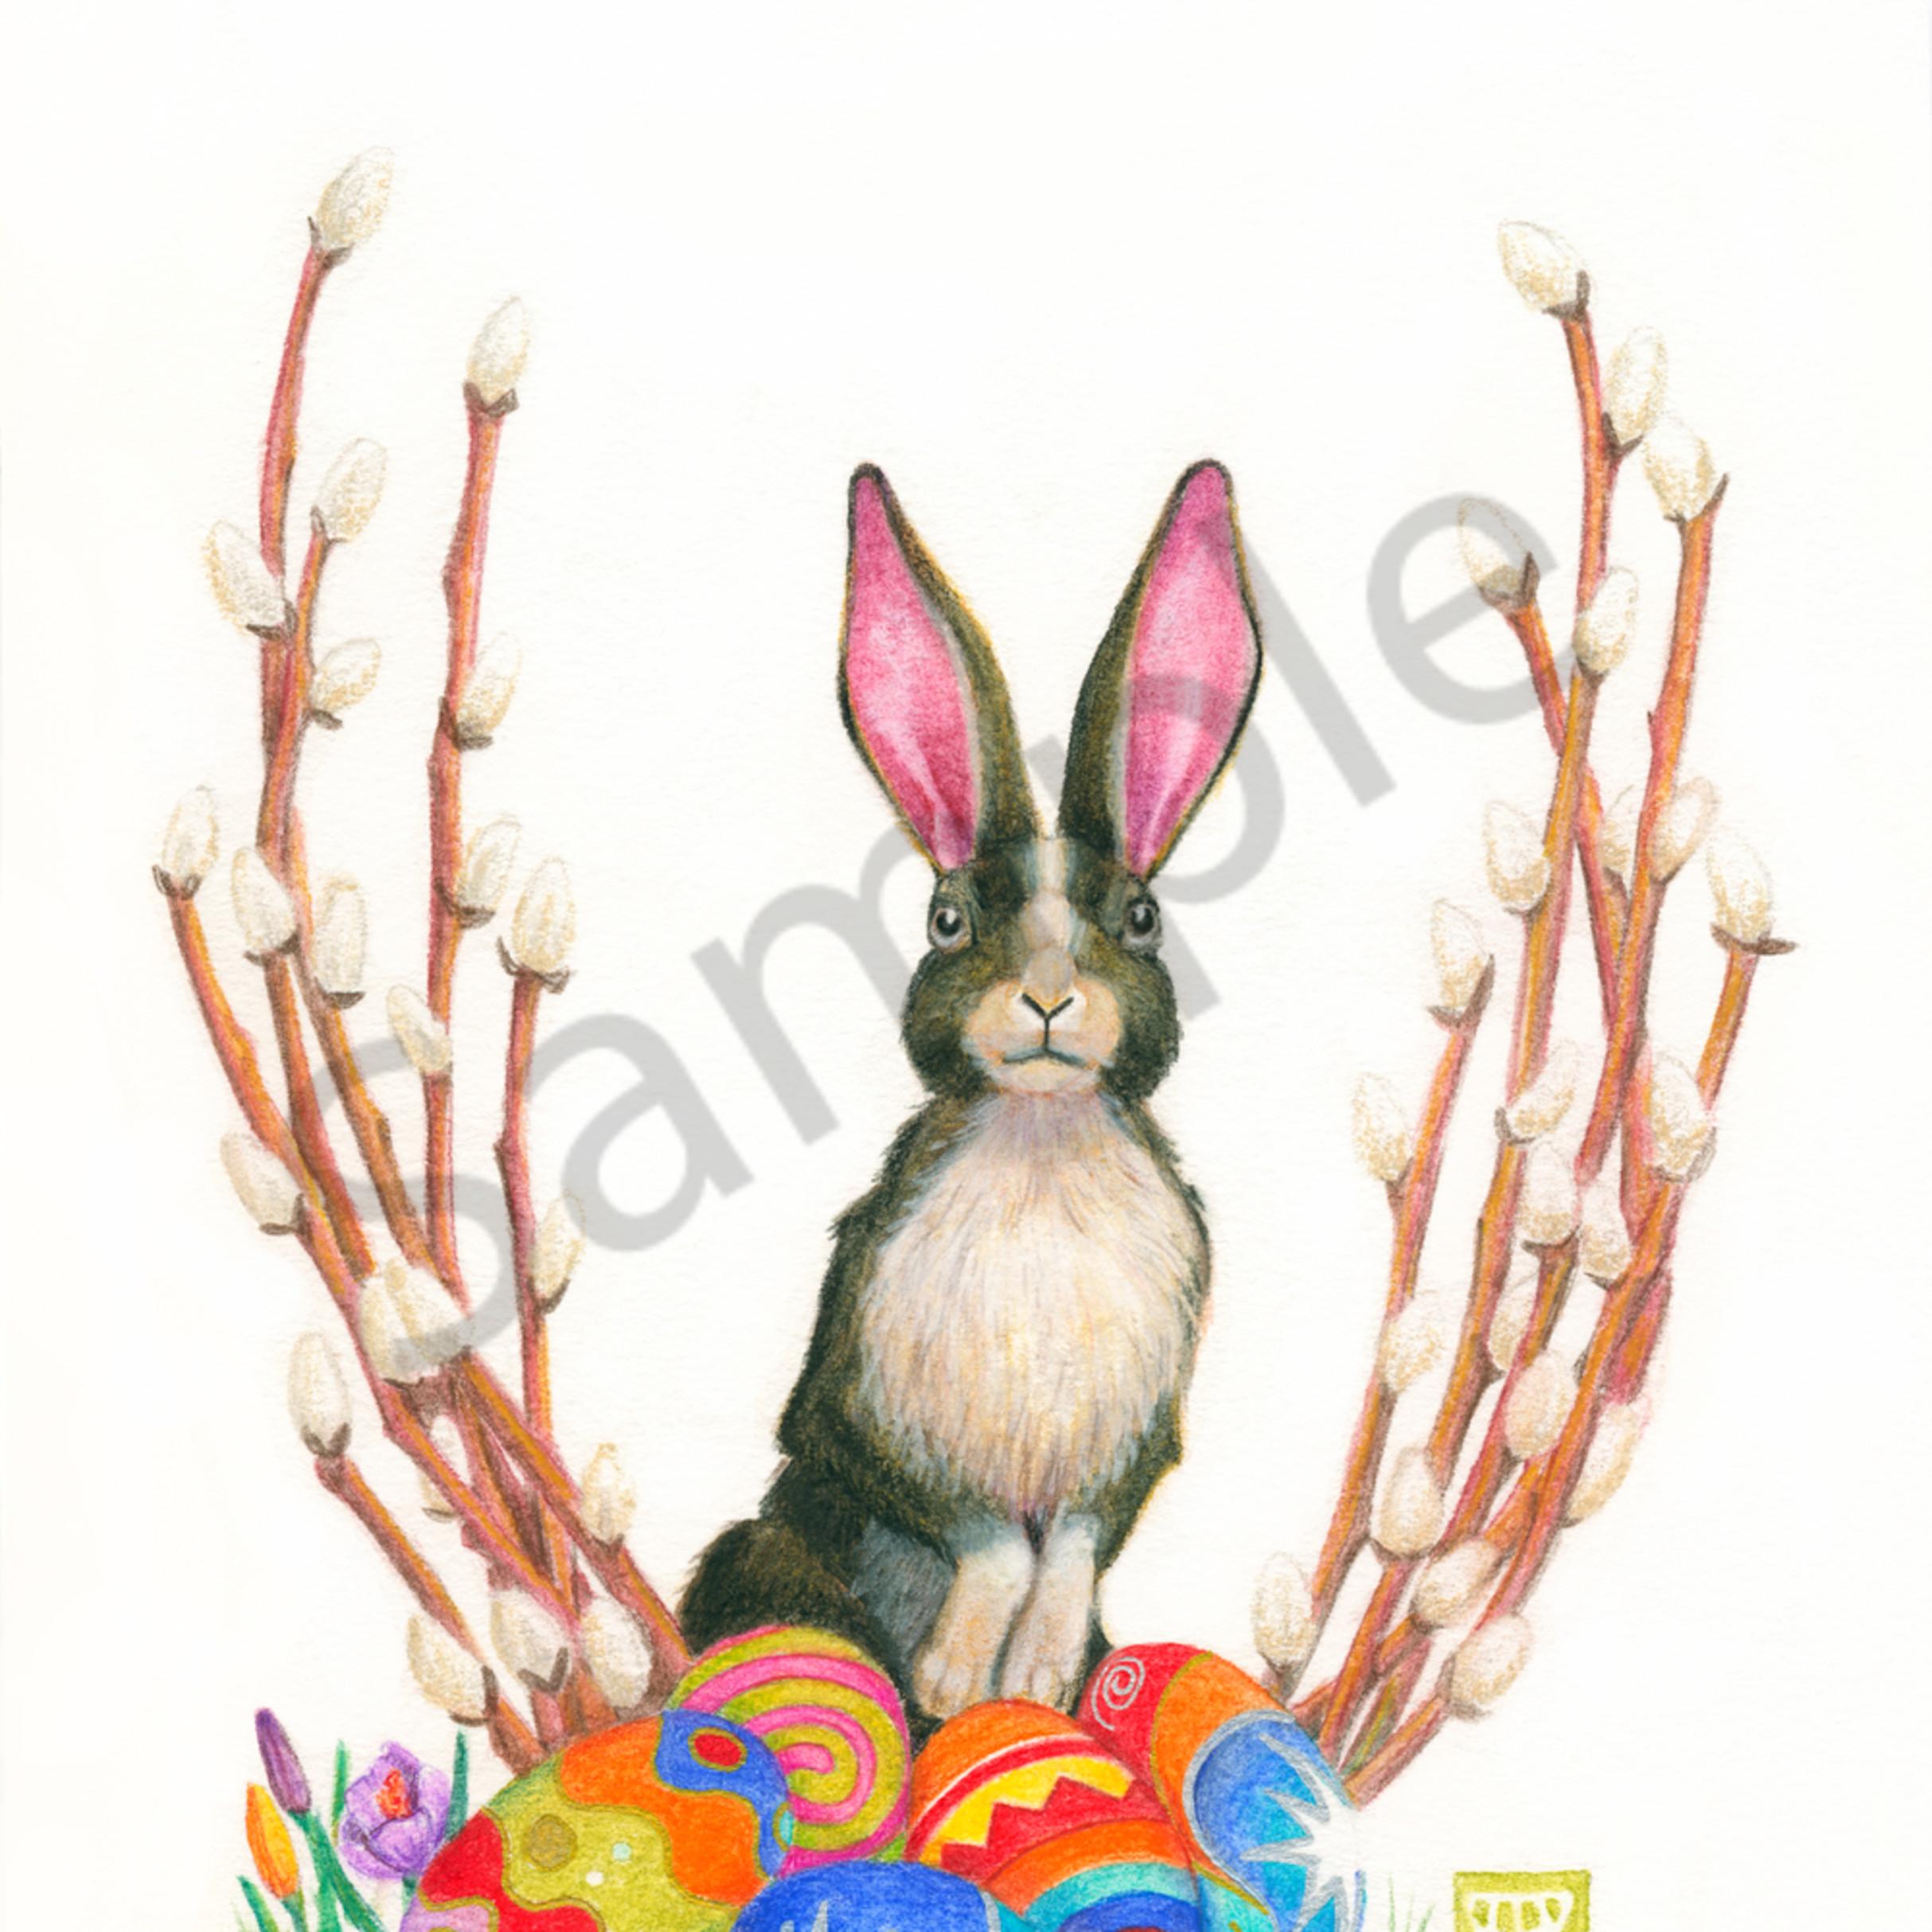 Ostara bunny2 olfpdo